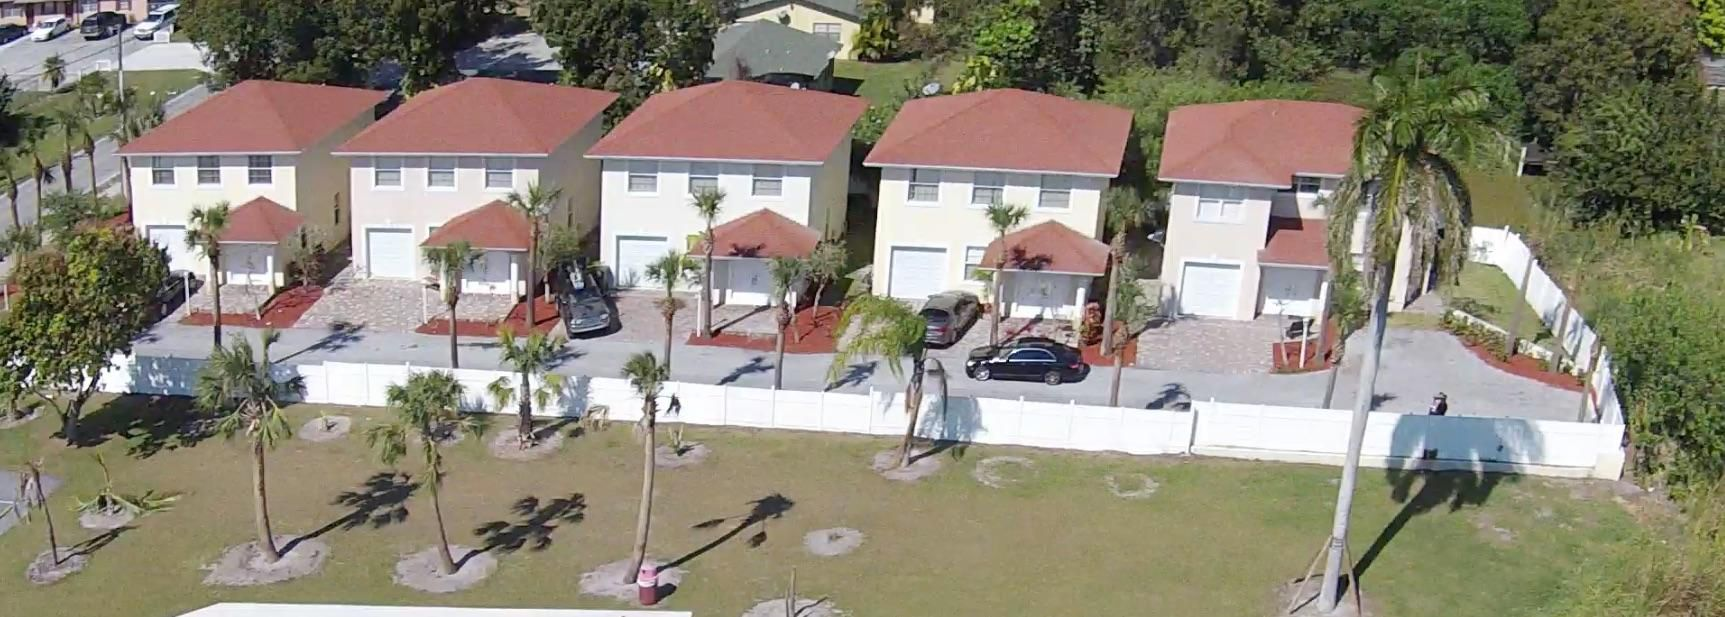 Quadraplex 为 销售 在 3686 Davis Road 3686 Davis Road Lake Worth, 佛罗里达州 33461 美国